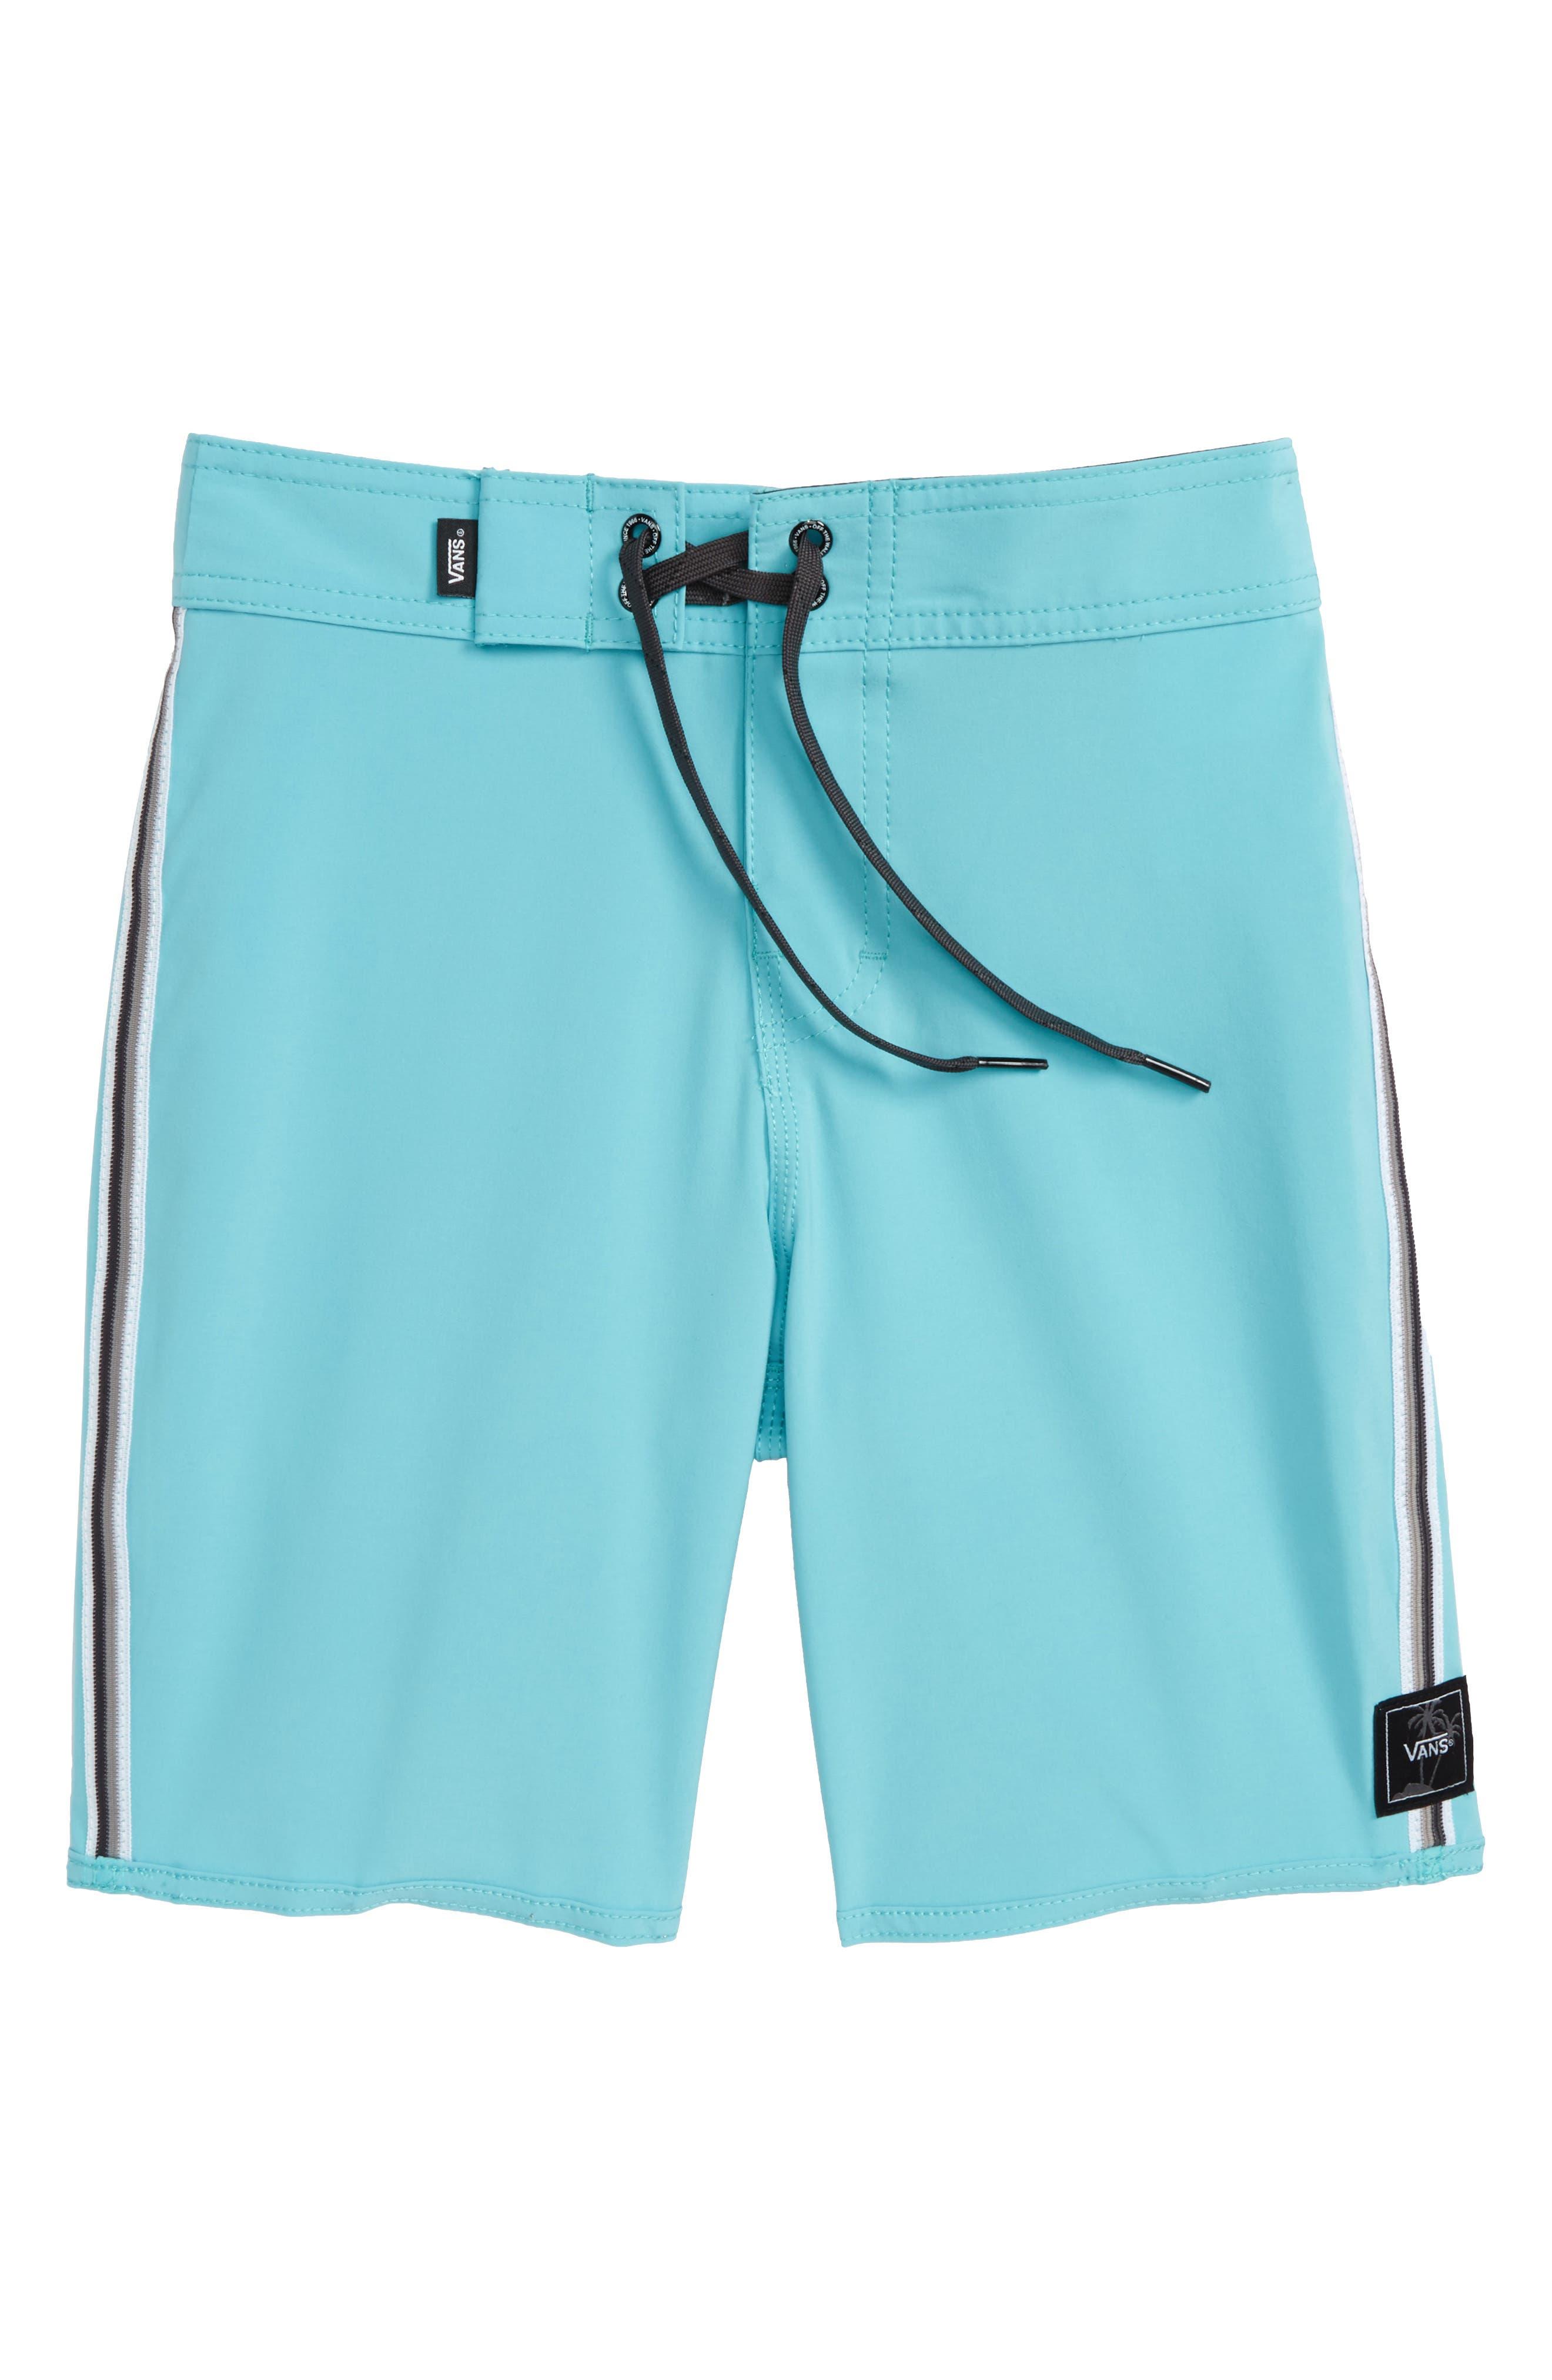 Sidestripe Board Shorts,                             Main thumbnail 1, color,                             Aquarelle